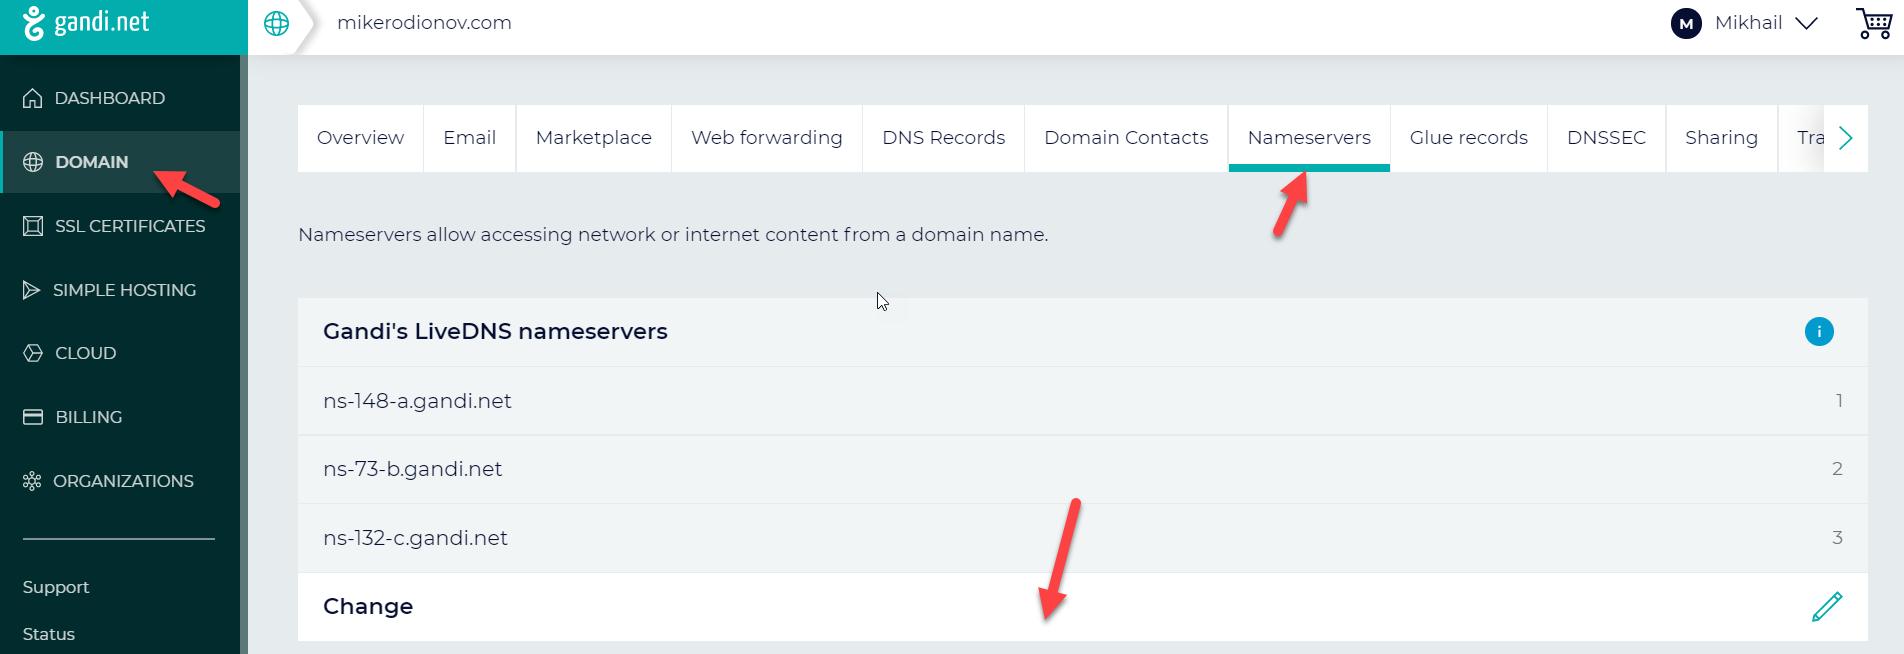 gandi.net DNS hosting – Changing Nameservers